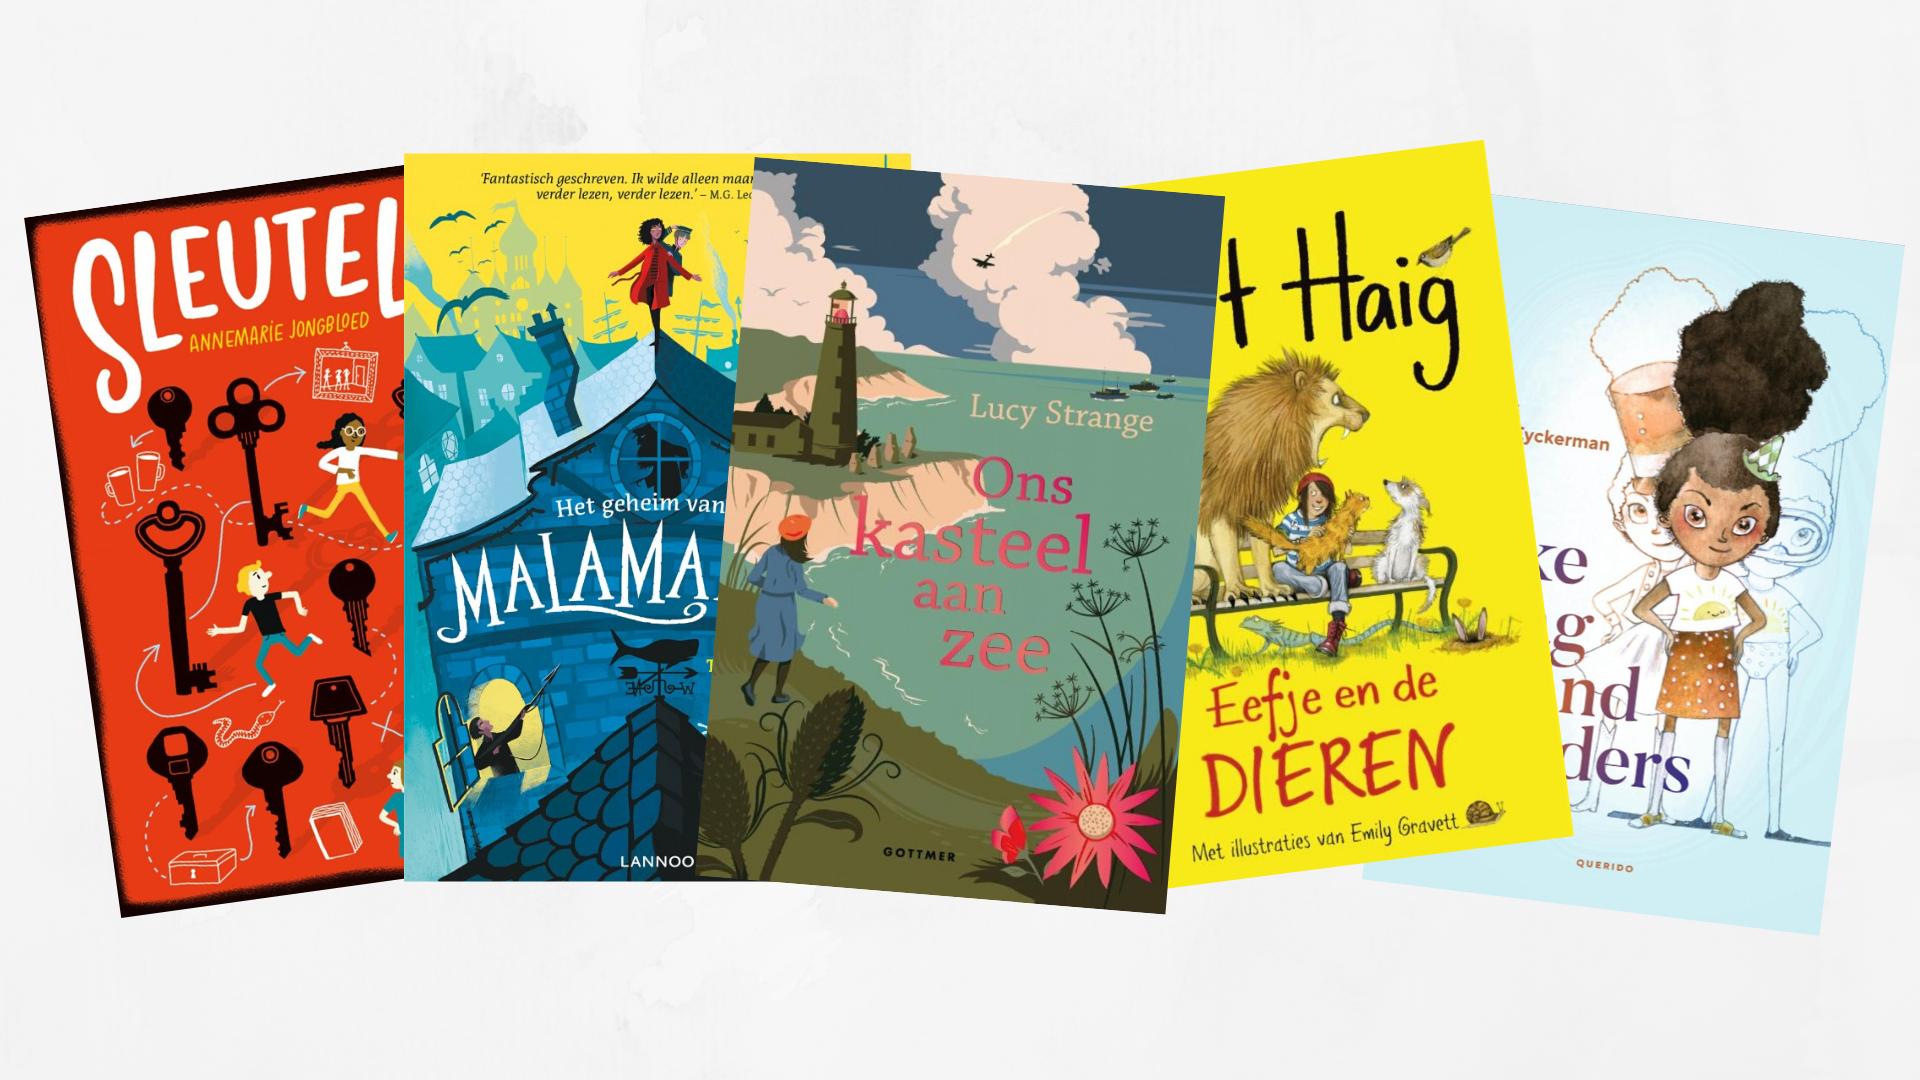 nieuwe kinderboeken februari 2020 Matt Haig Jeff Aerts